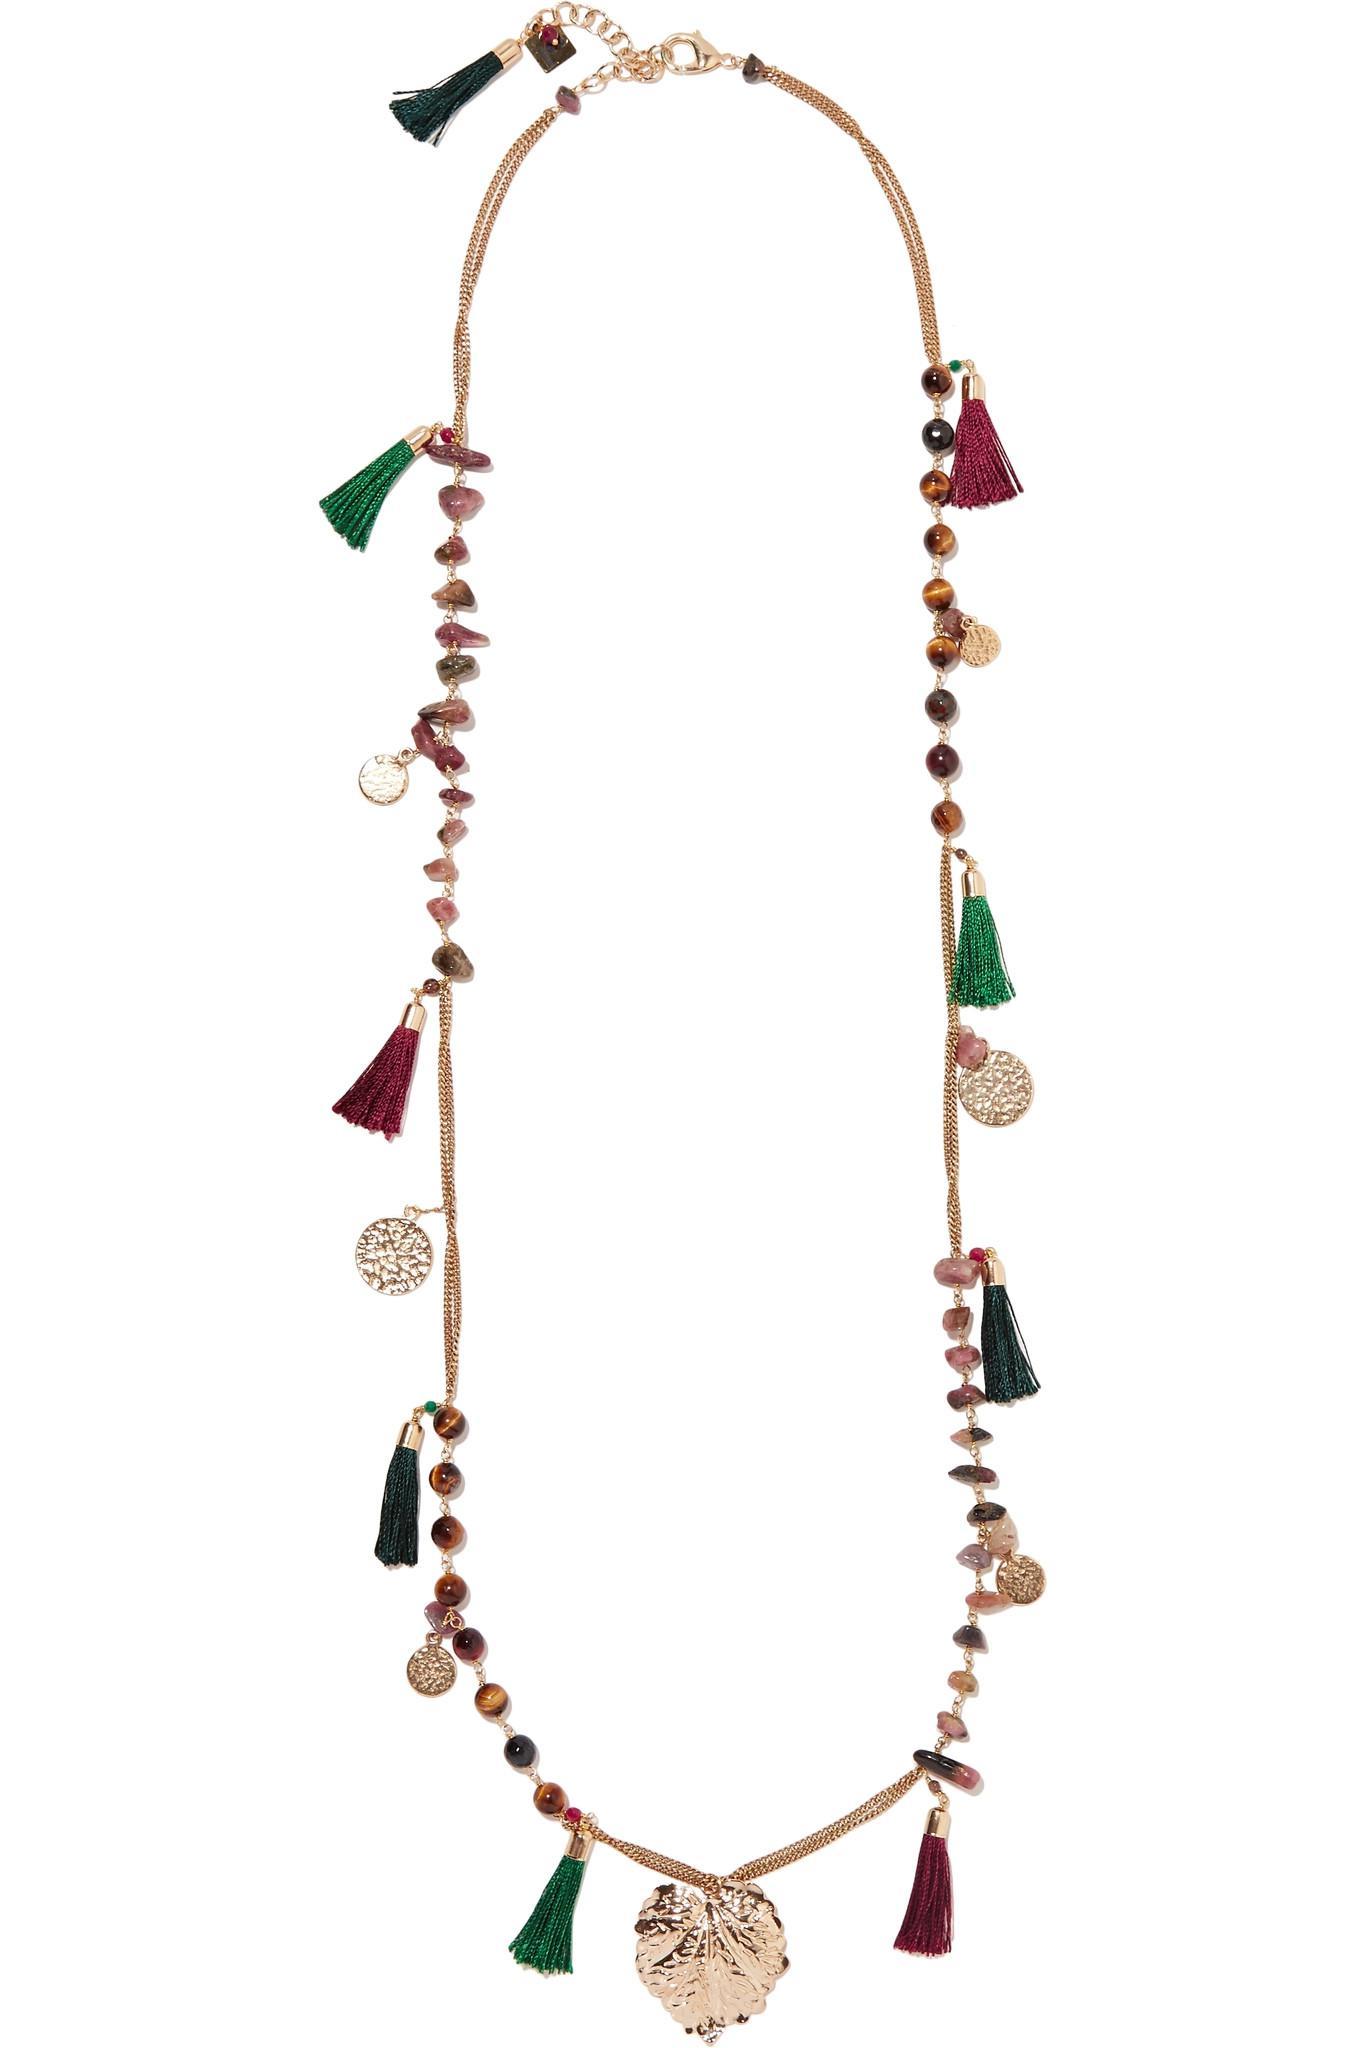 Rosantica Woman Gold-tone Chain Tassel Necklace Gold Size Rosantica 4jUE0anKSs